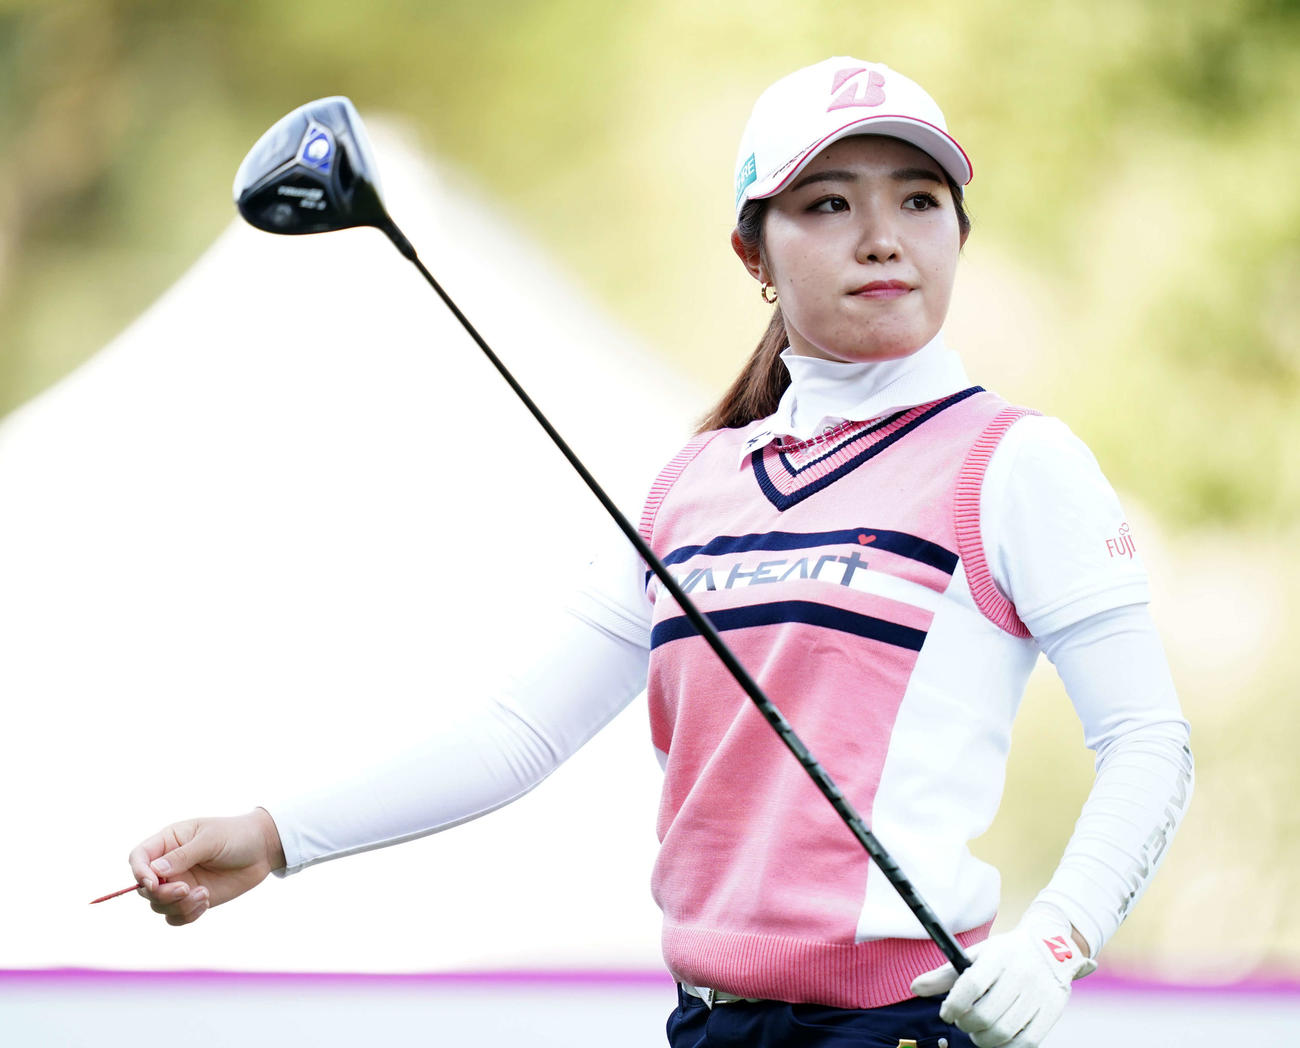 https://www.nikkansports.com/sports/golf/news/img/202104030000045-w1300_0.jpg